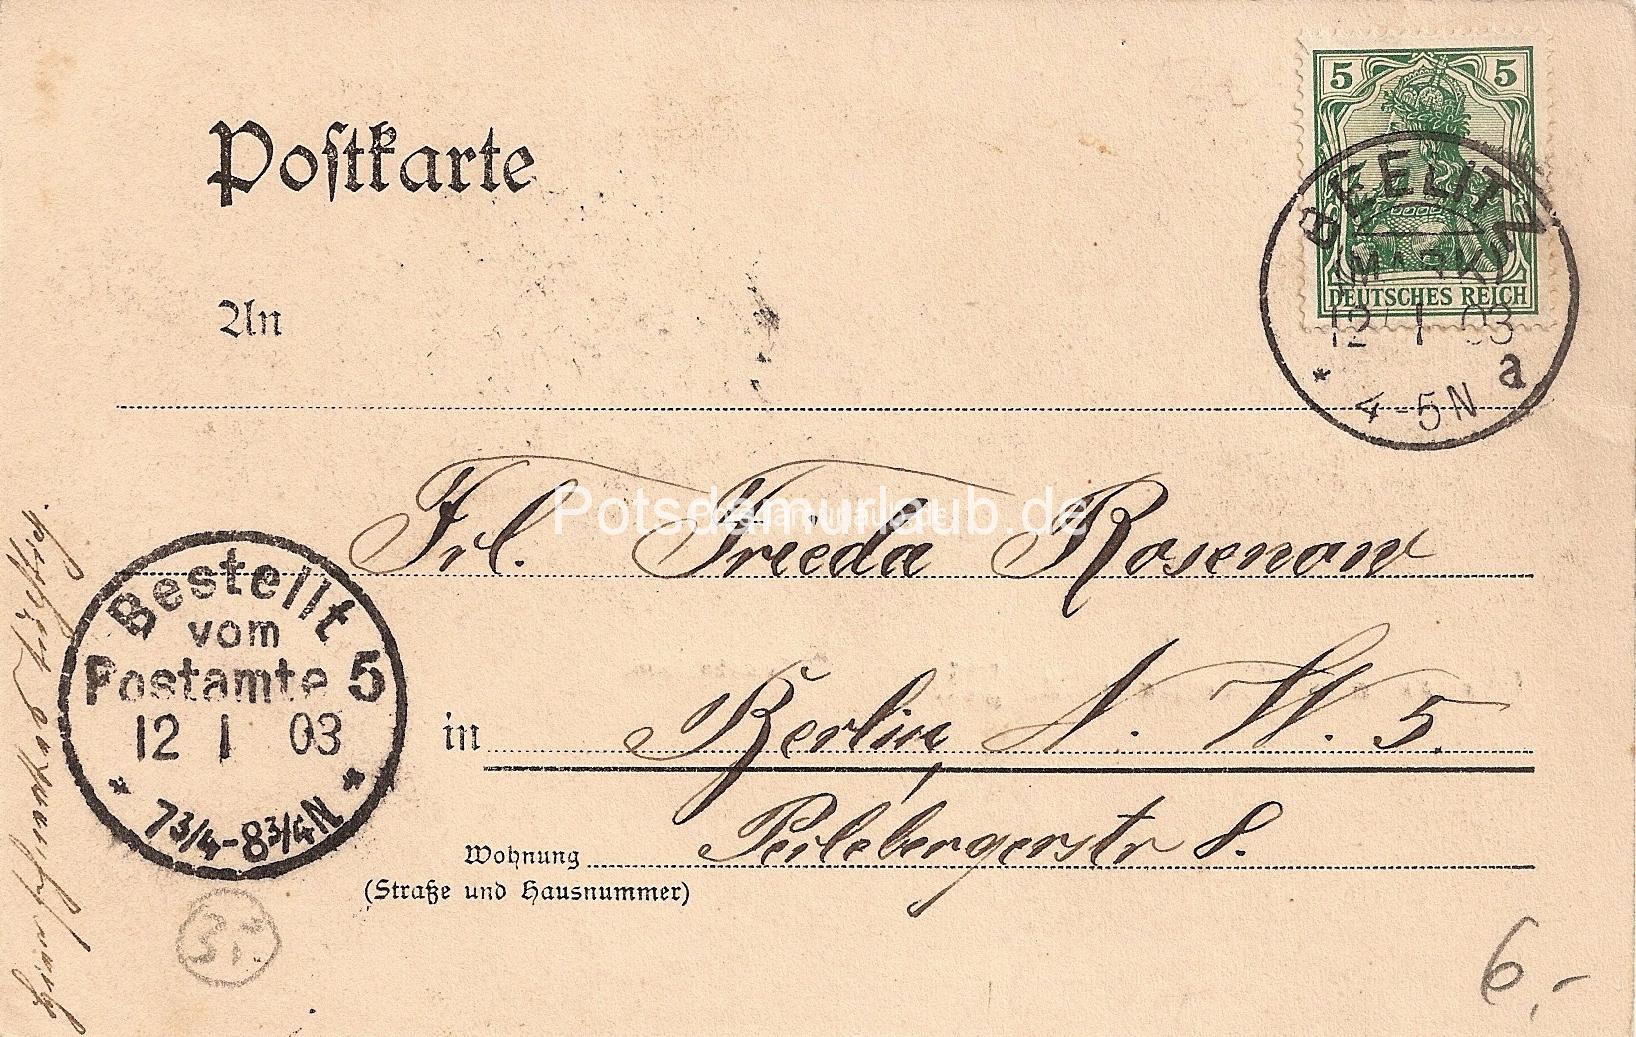 1903 01 12